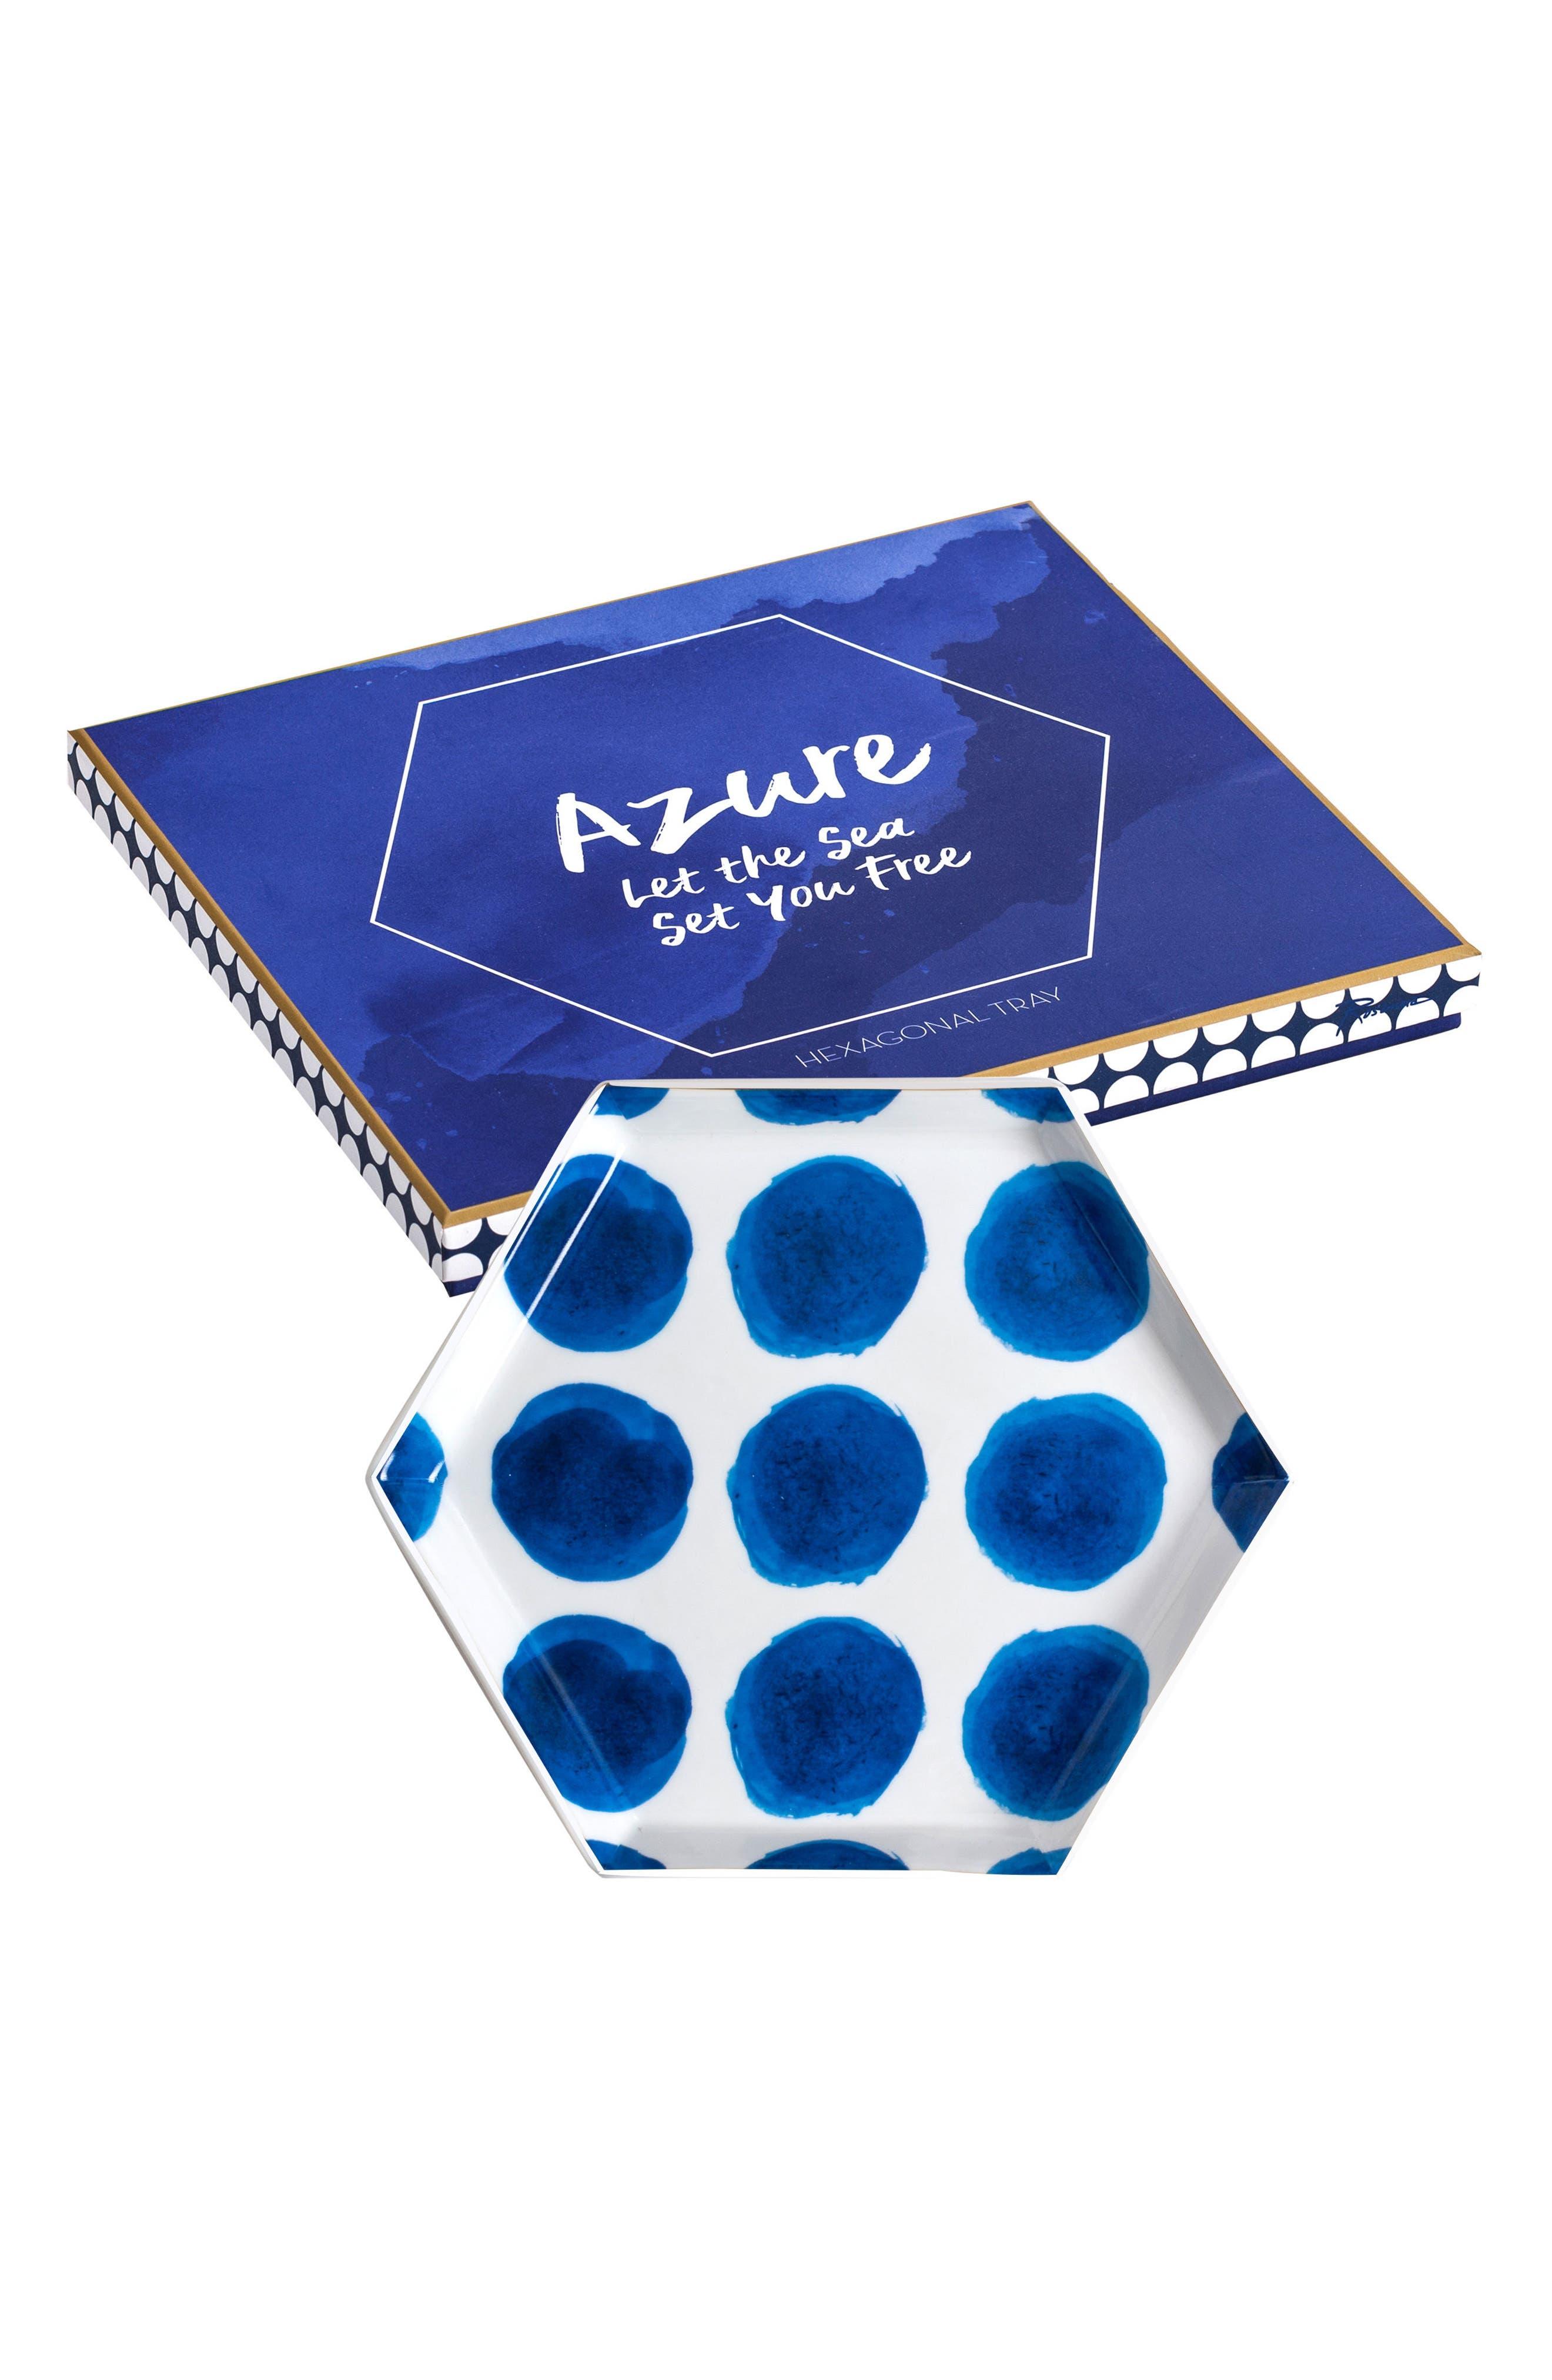 Polka Dot Hexagon Tray,                             Main thumbnail 1, color,                             White/ Blue